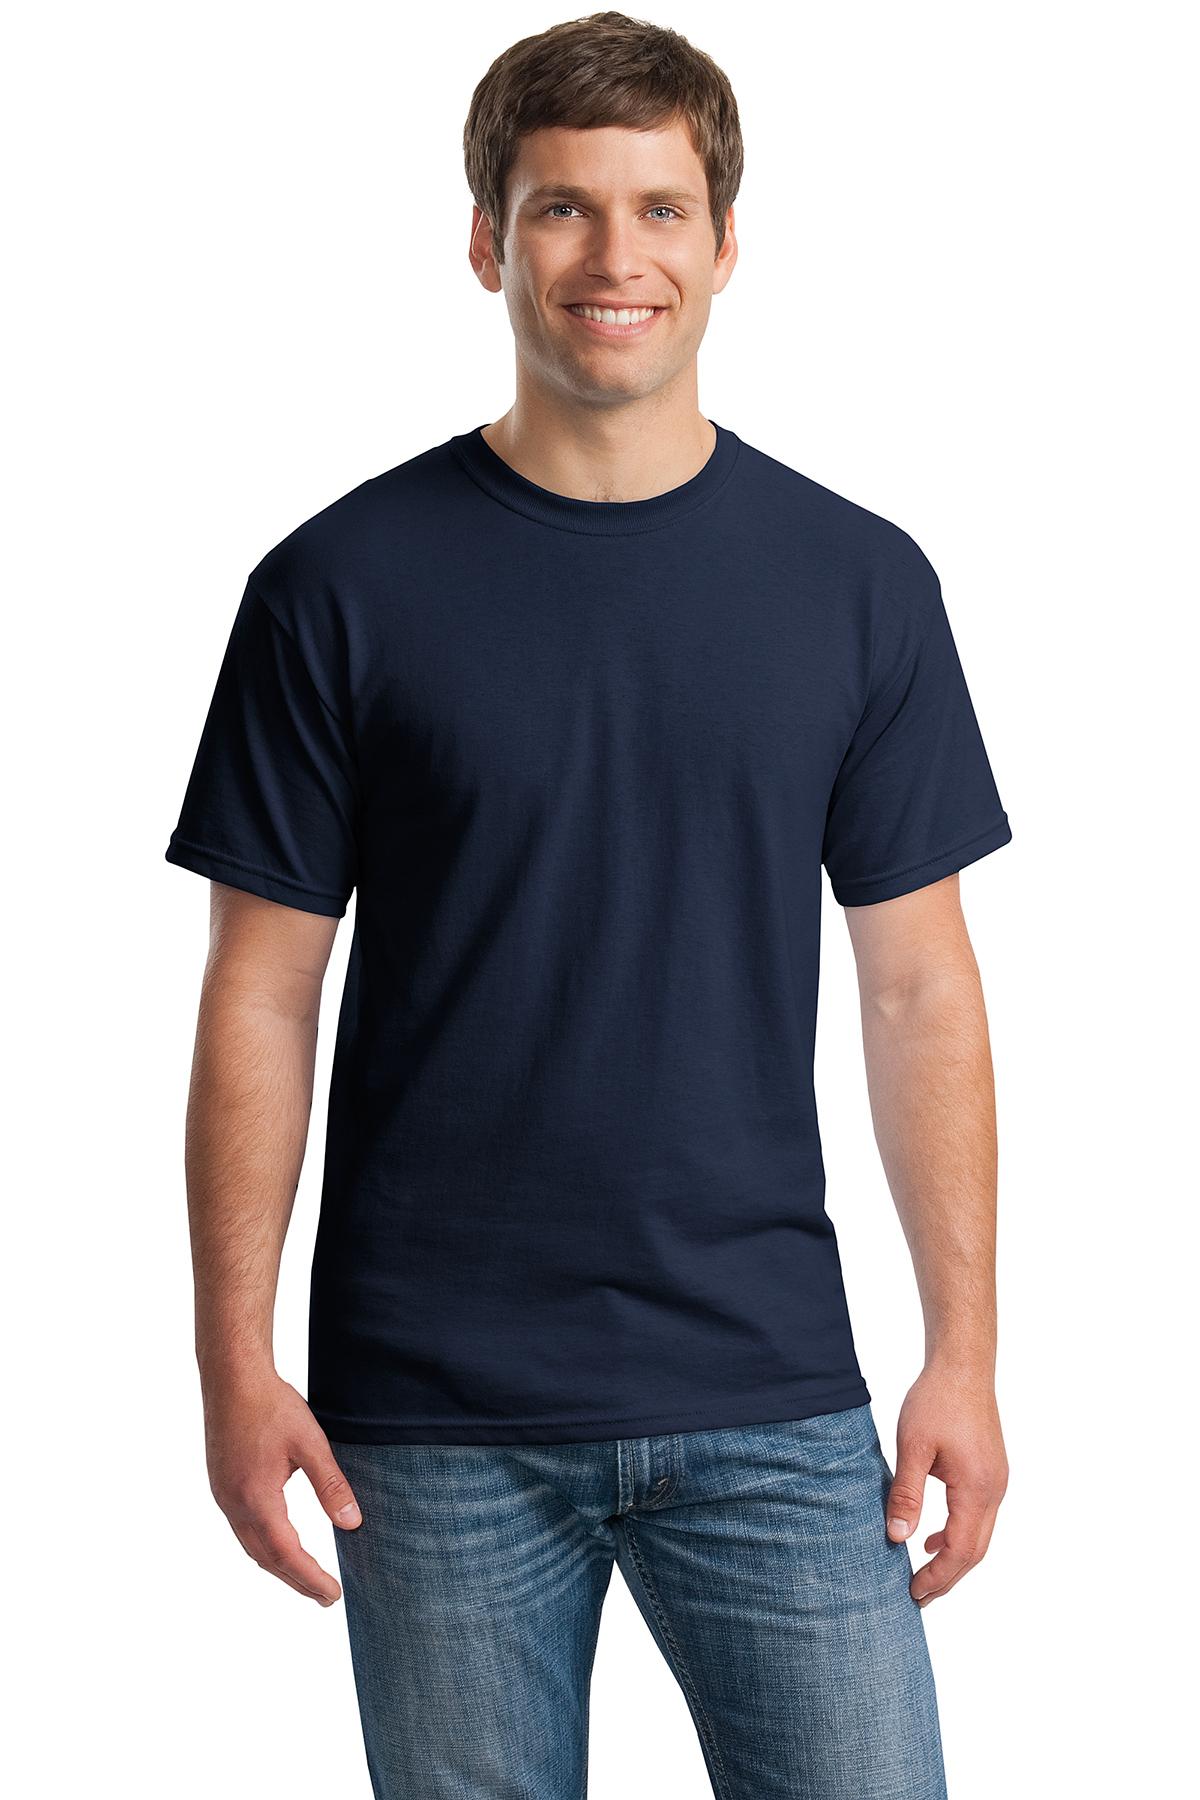 Gildan® - Heavy Cotton 100% Cotton T-Shirt.-Gildan